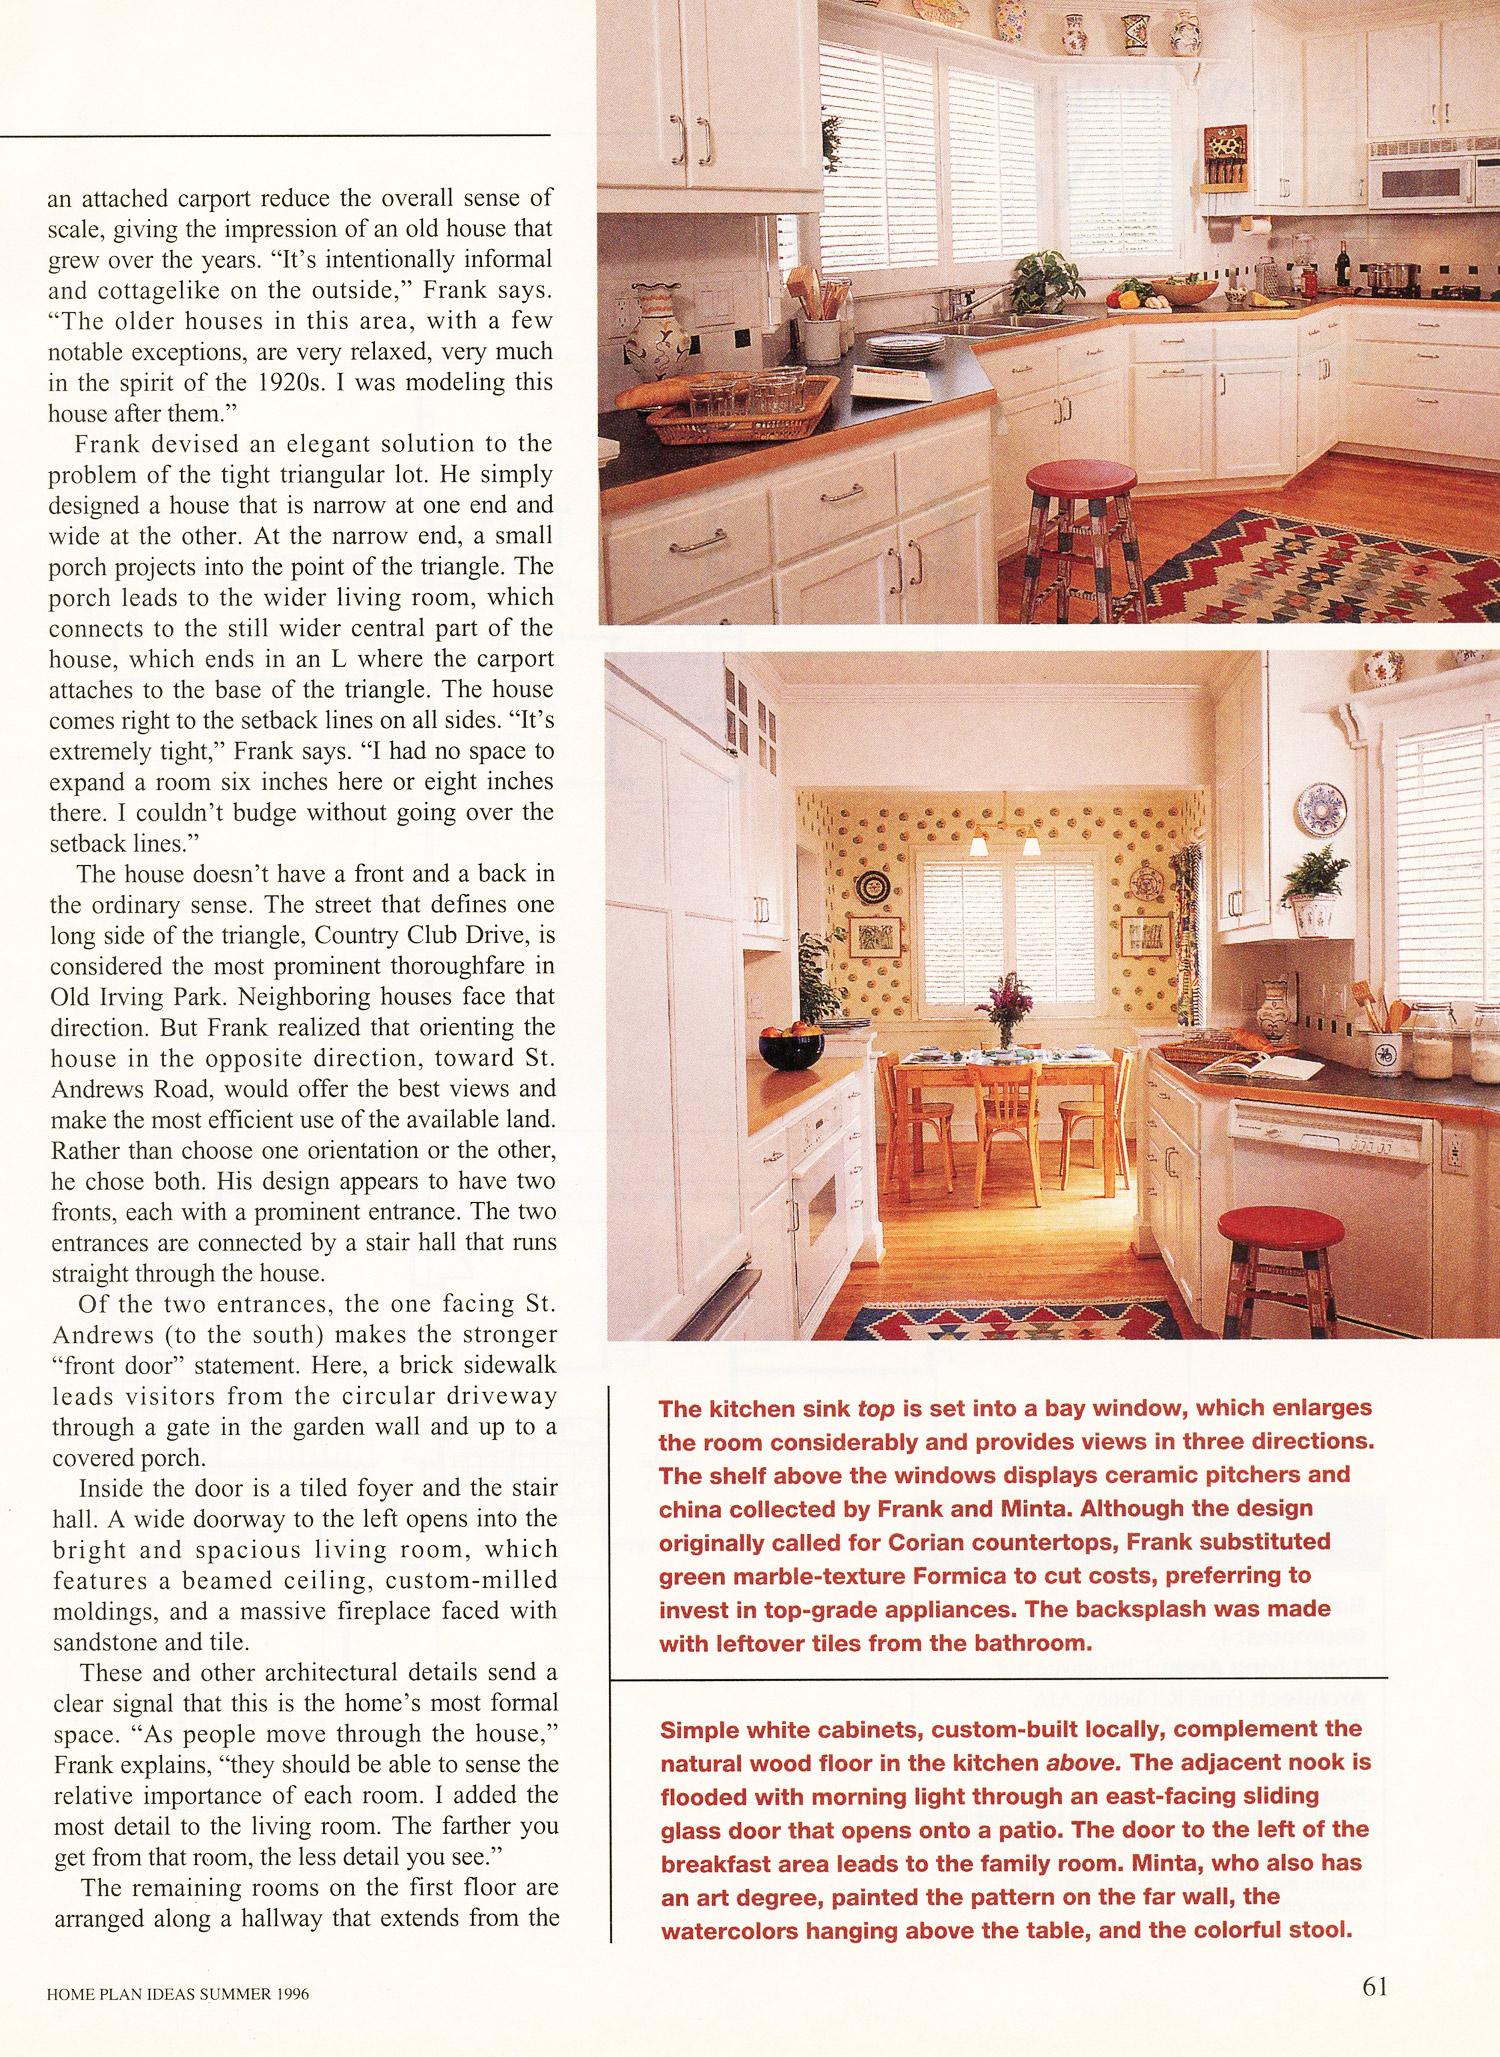 home-plan-ideas-summer-1996-frank-cheney-architect-6.jpg